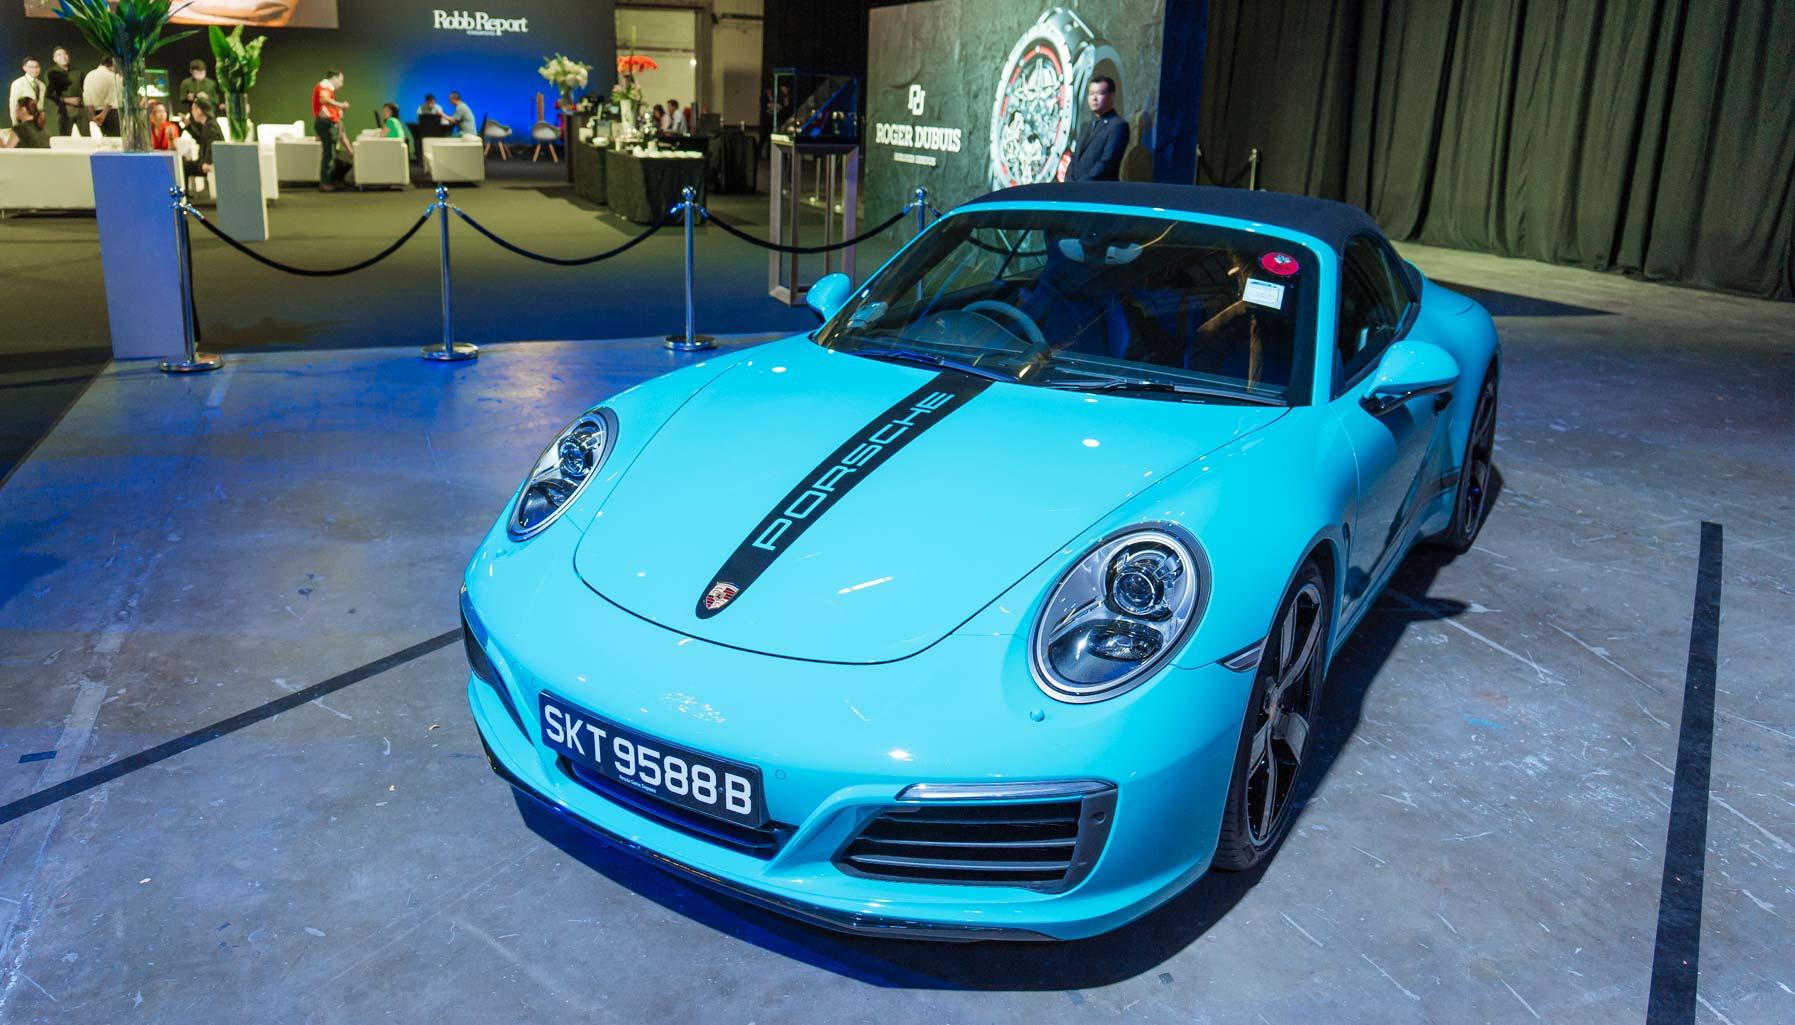 Coty 2016 contender: Porsche 911 Carrera S Cabriolet